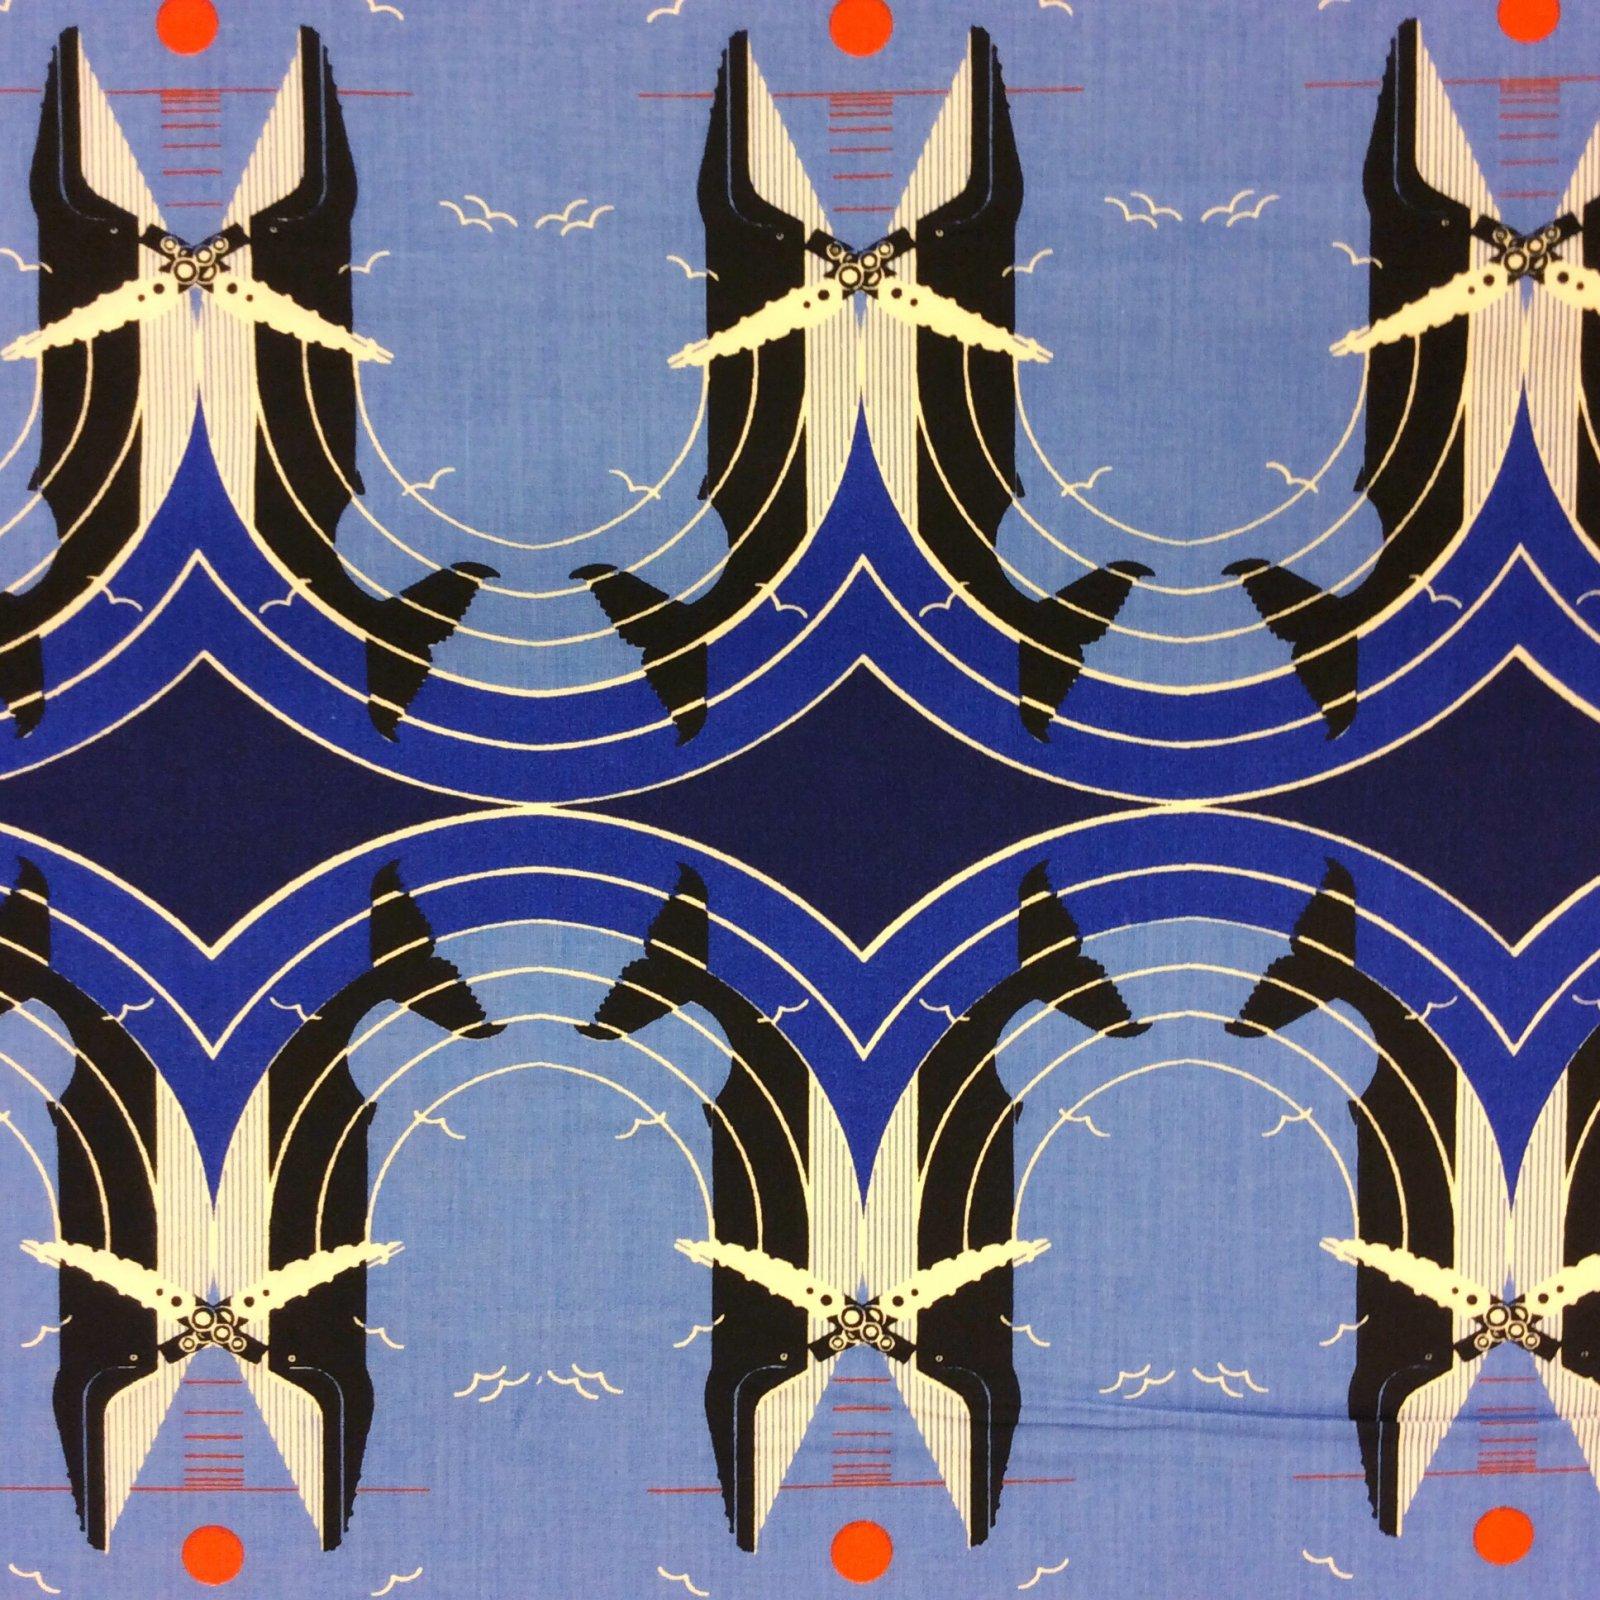 Charley Harper Whale Love on the Richter Scale Fibonacci Arc Ocean Water Sunset Organic Cotton Fabric CHB40